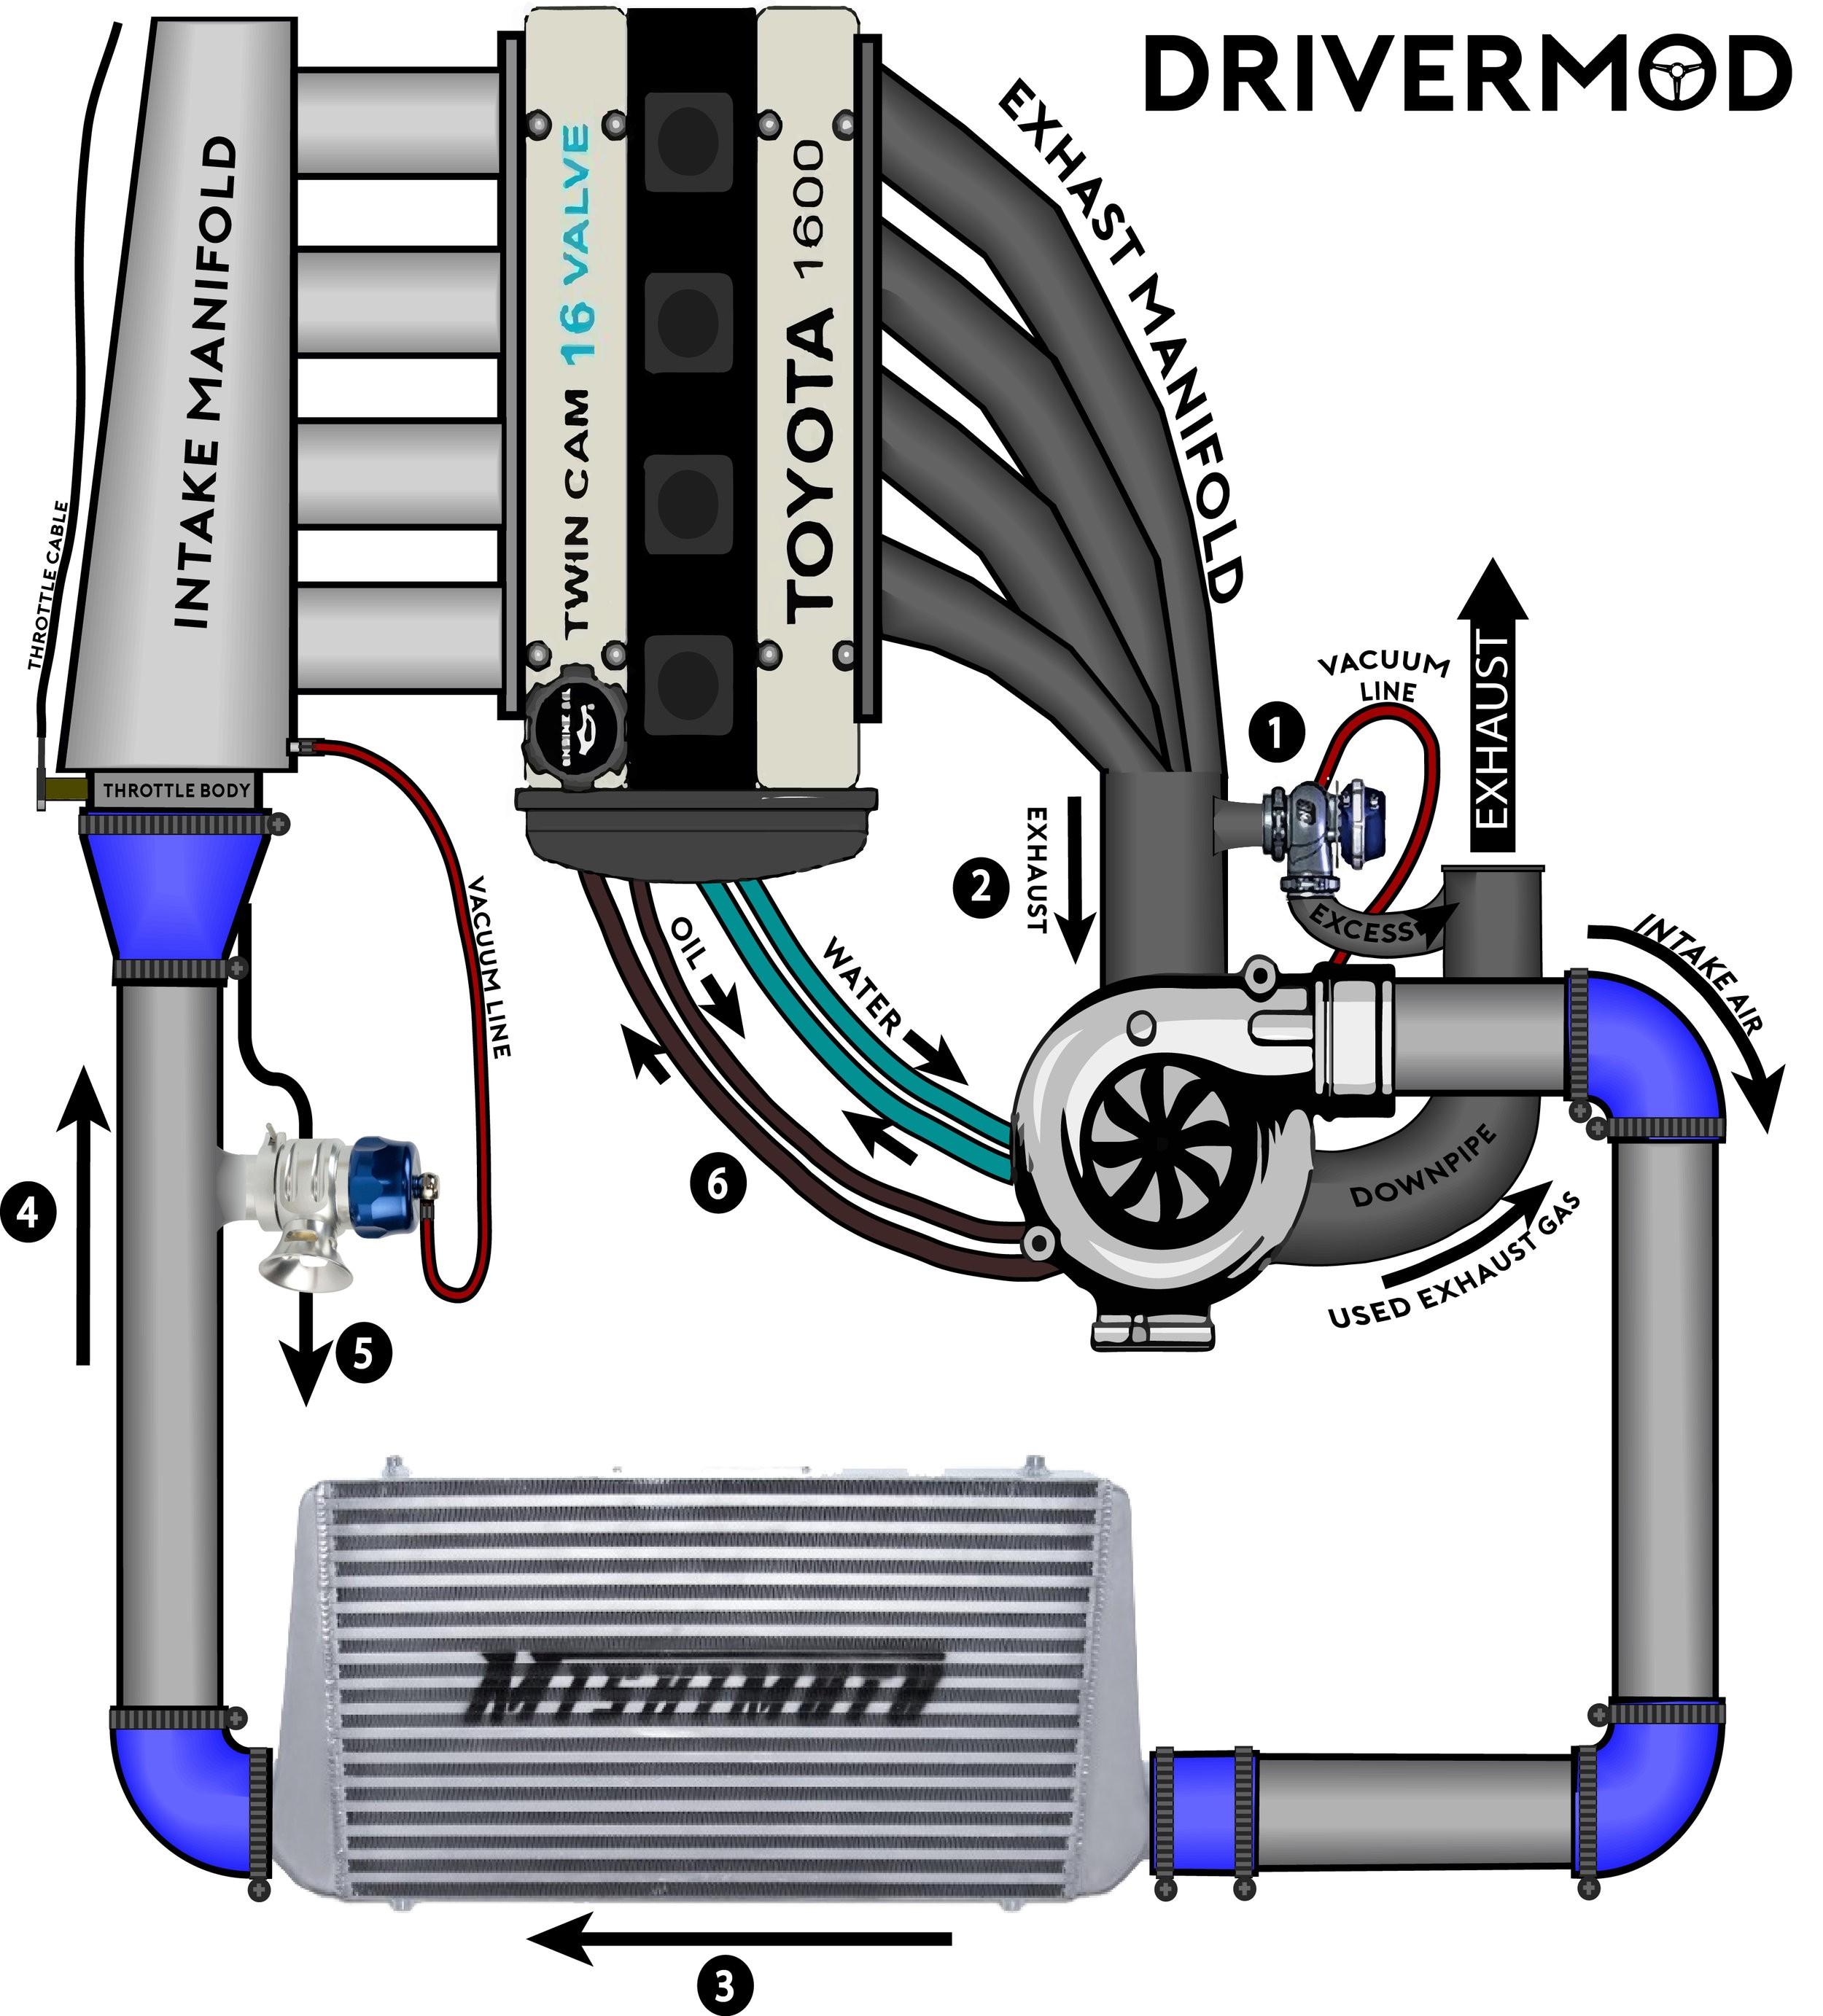 Turbo System Diagram Turbocharging for Dummies – Drivermod